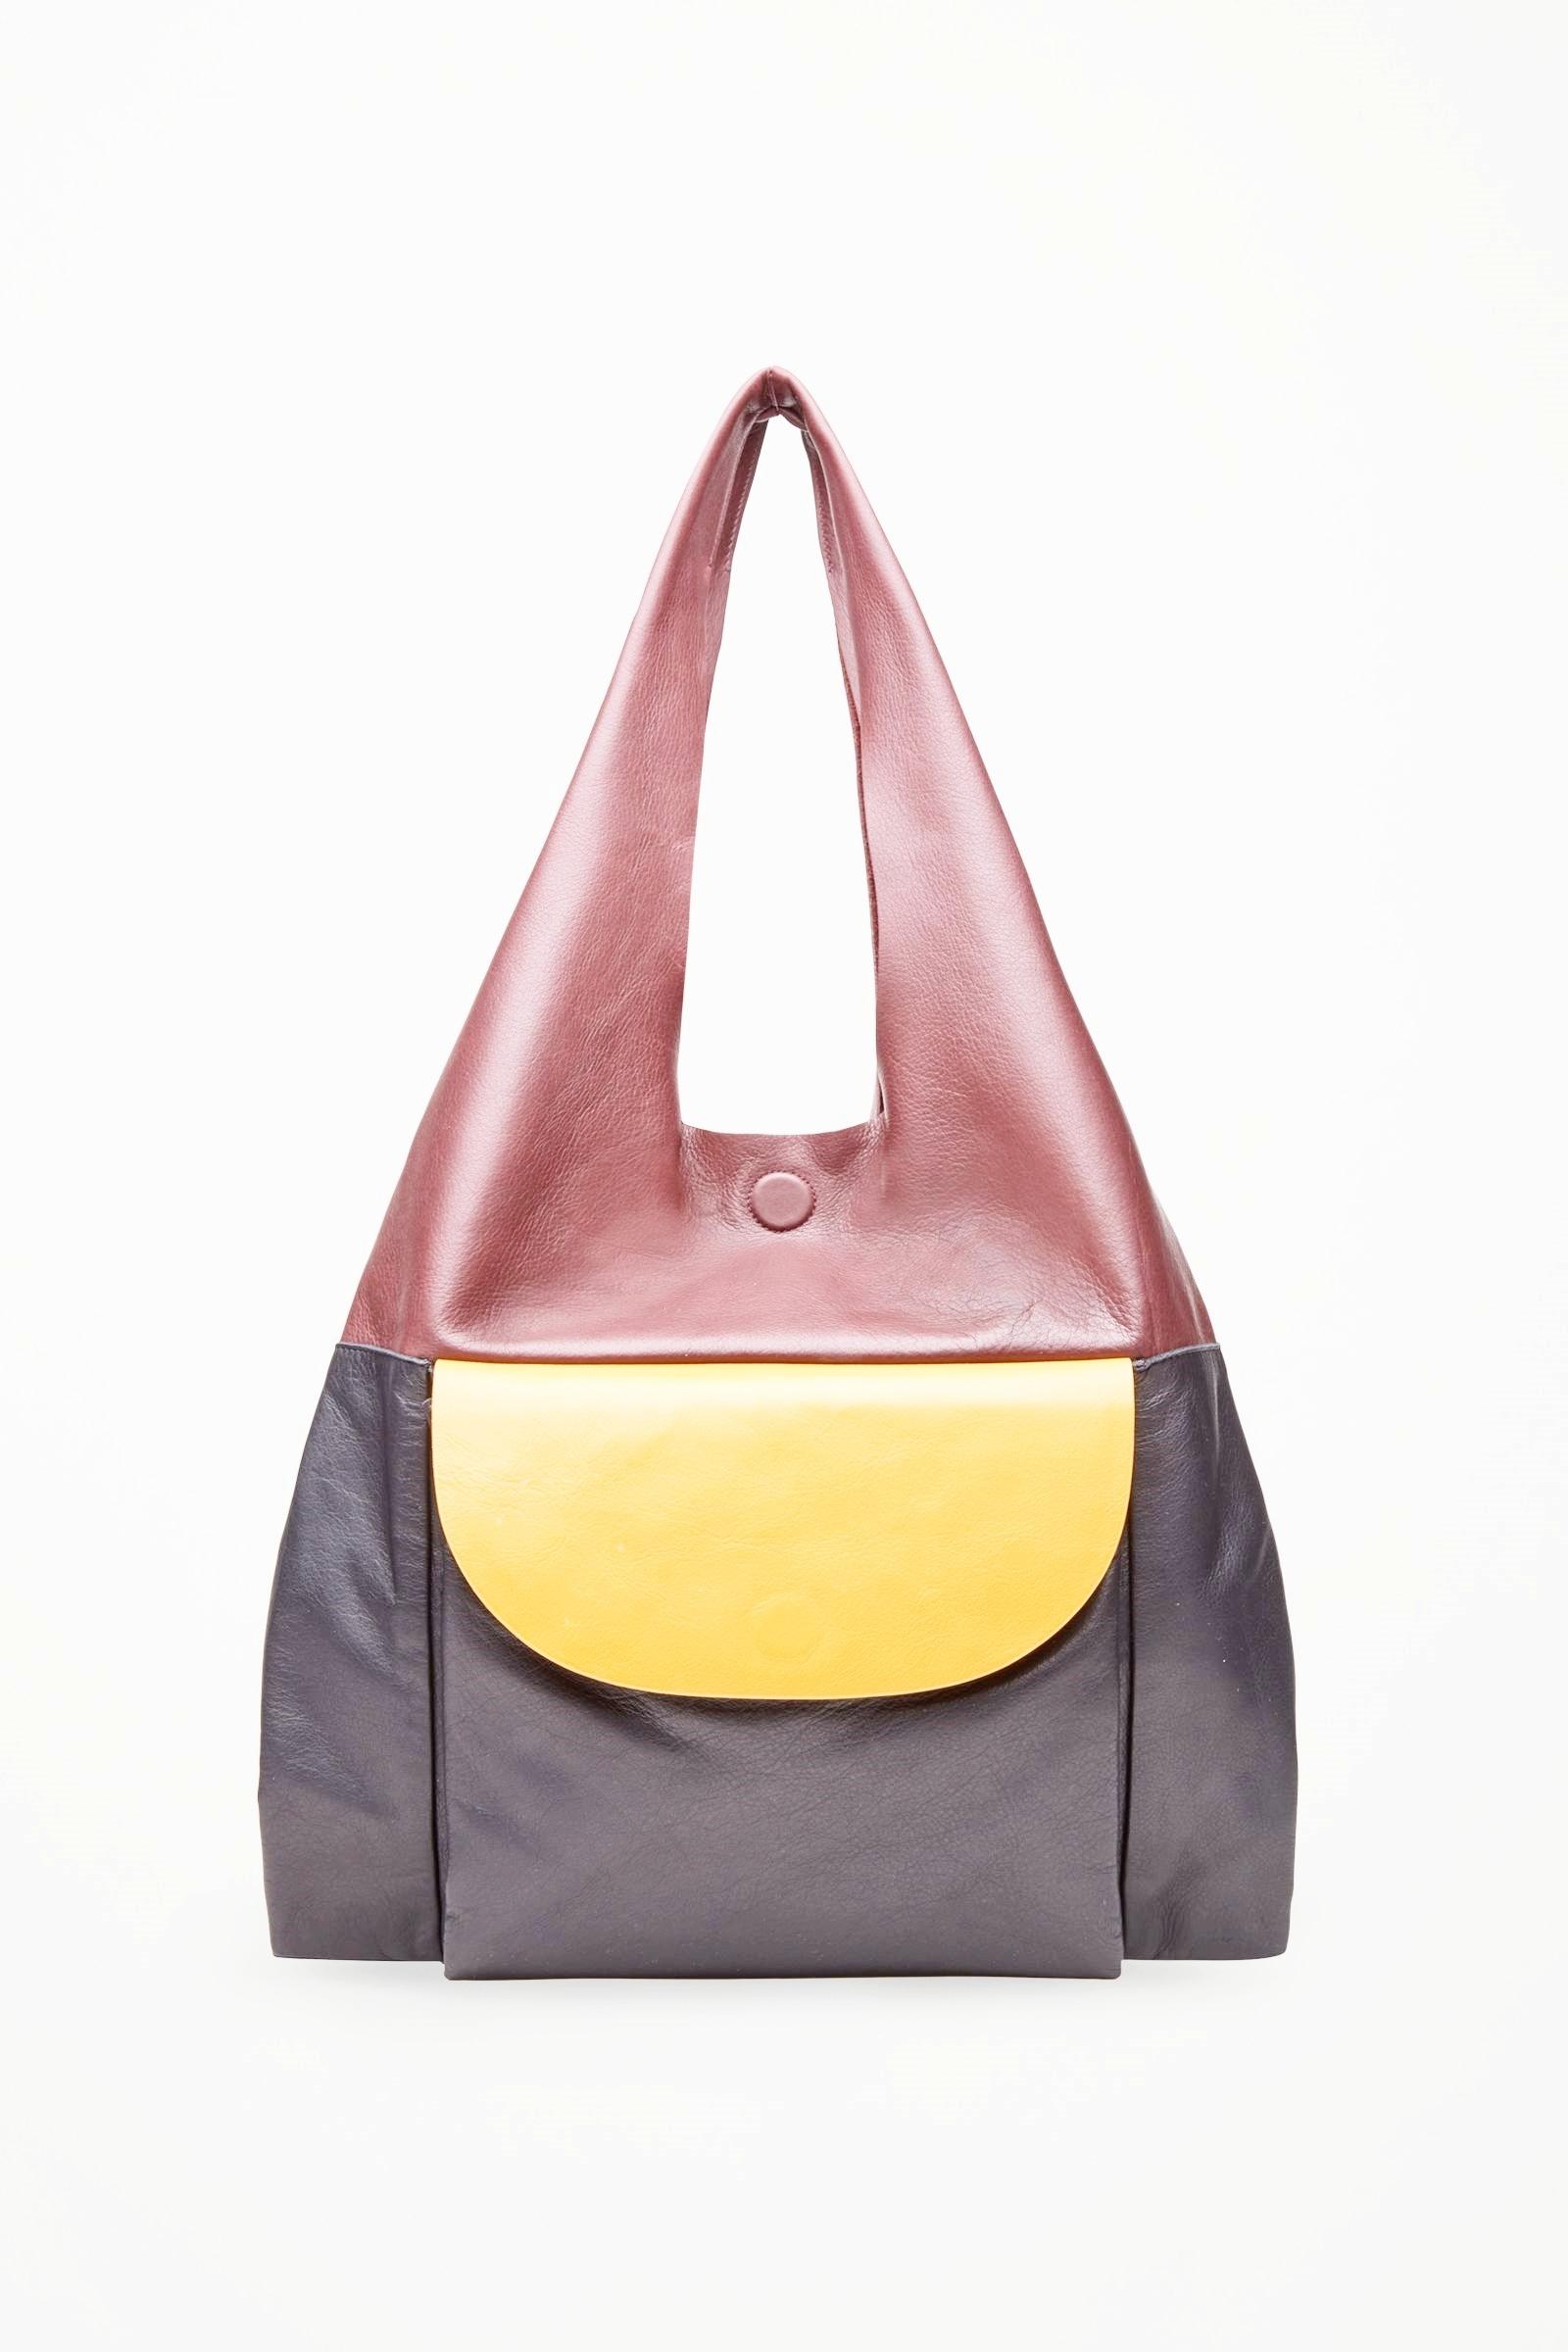 Bag, £125, Cos